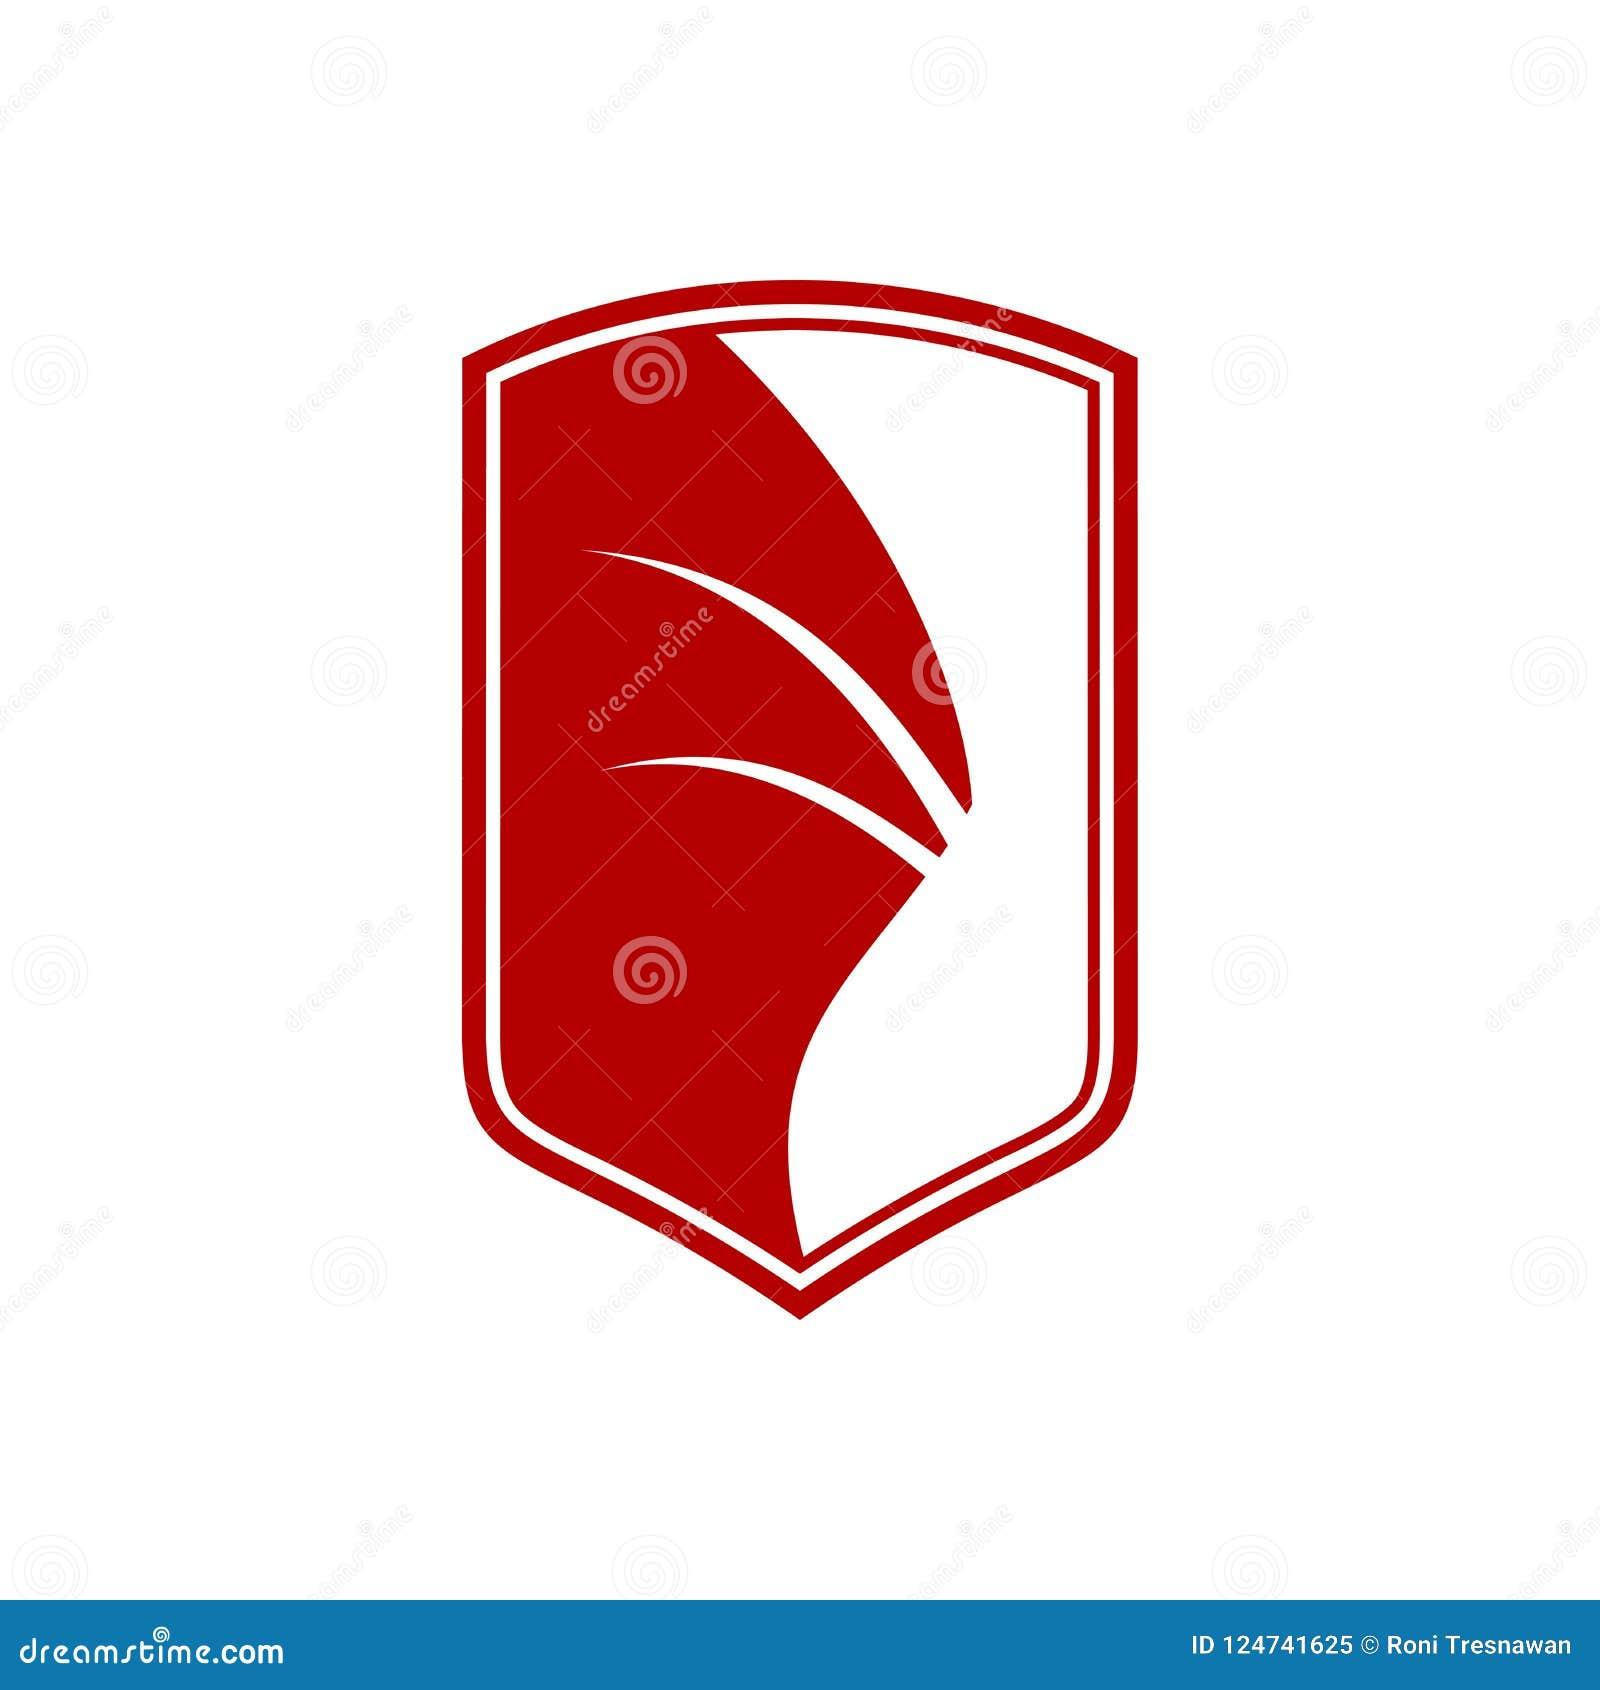 Dragon Wing Shield Sigil Symbol Graphic Design Stock Vector